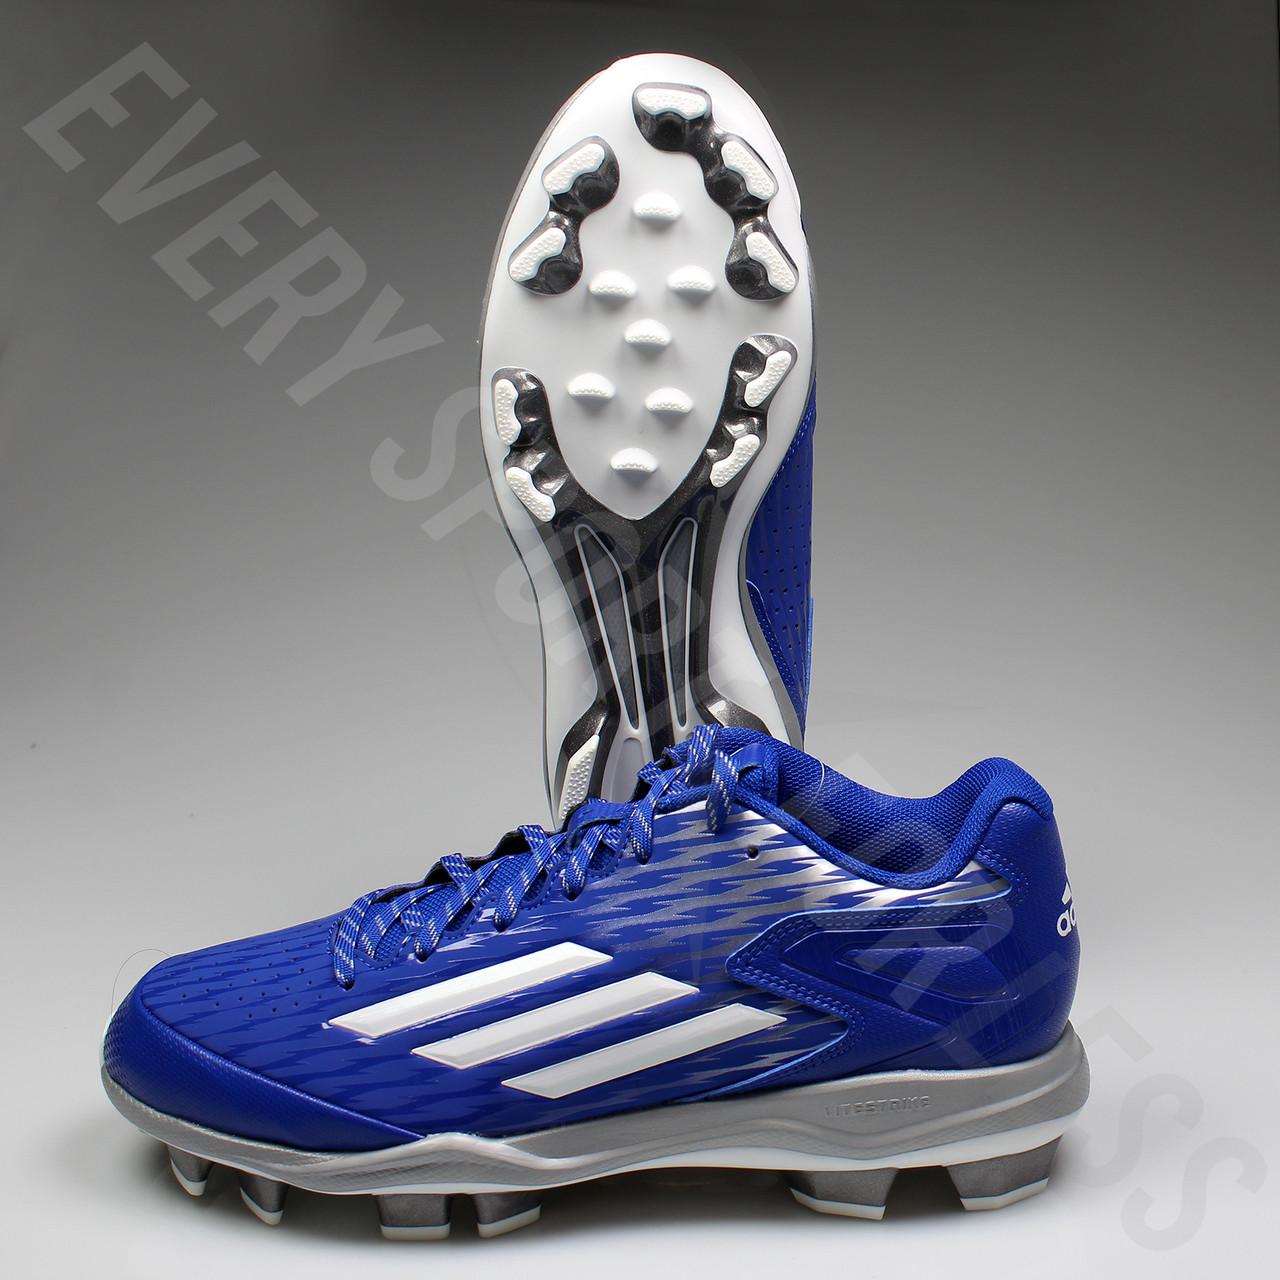 a14a1ef6113 ... Adidas Power Alley 3 TPU Men s Baseball Cleats S84752 - Royal